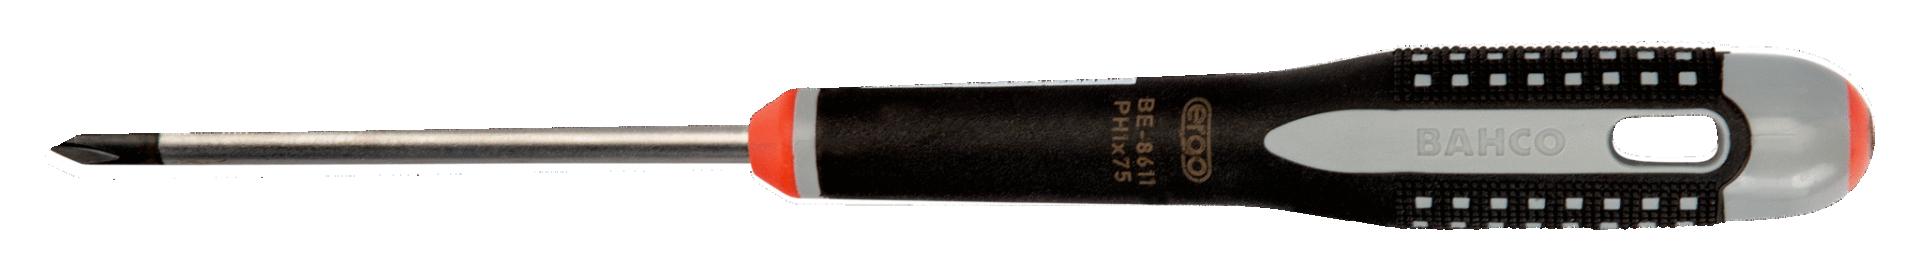 Wkrętak Phillips PH0 x 100 mm Ergo Bahco (nr kat. BE-8605)